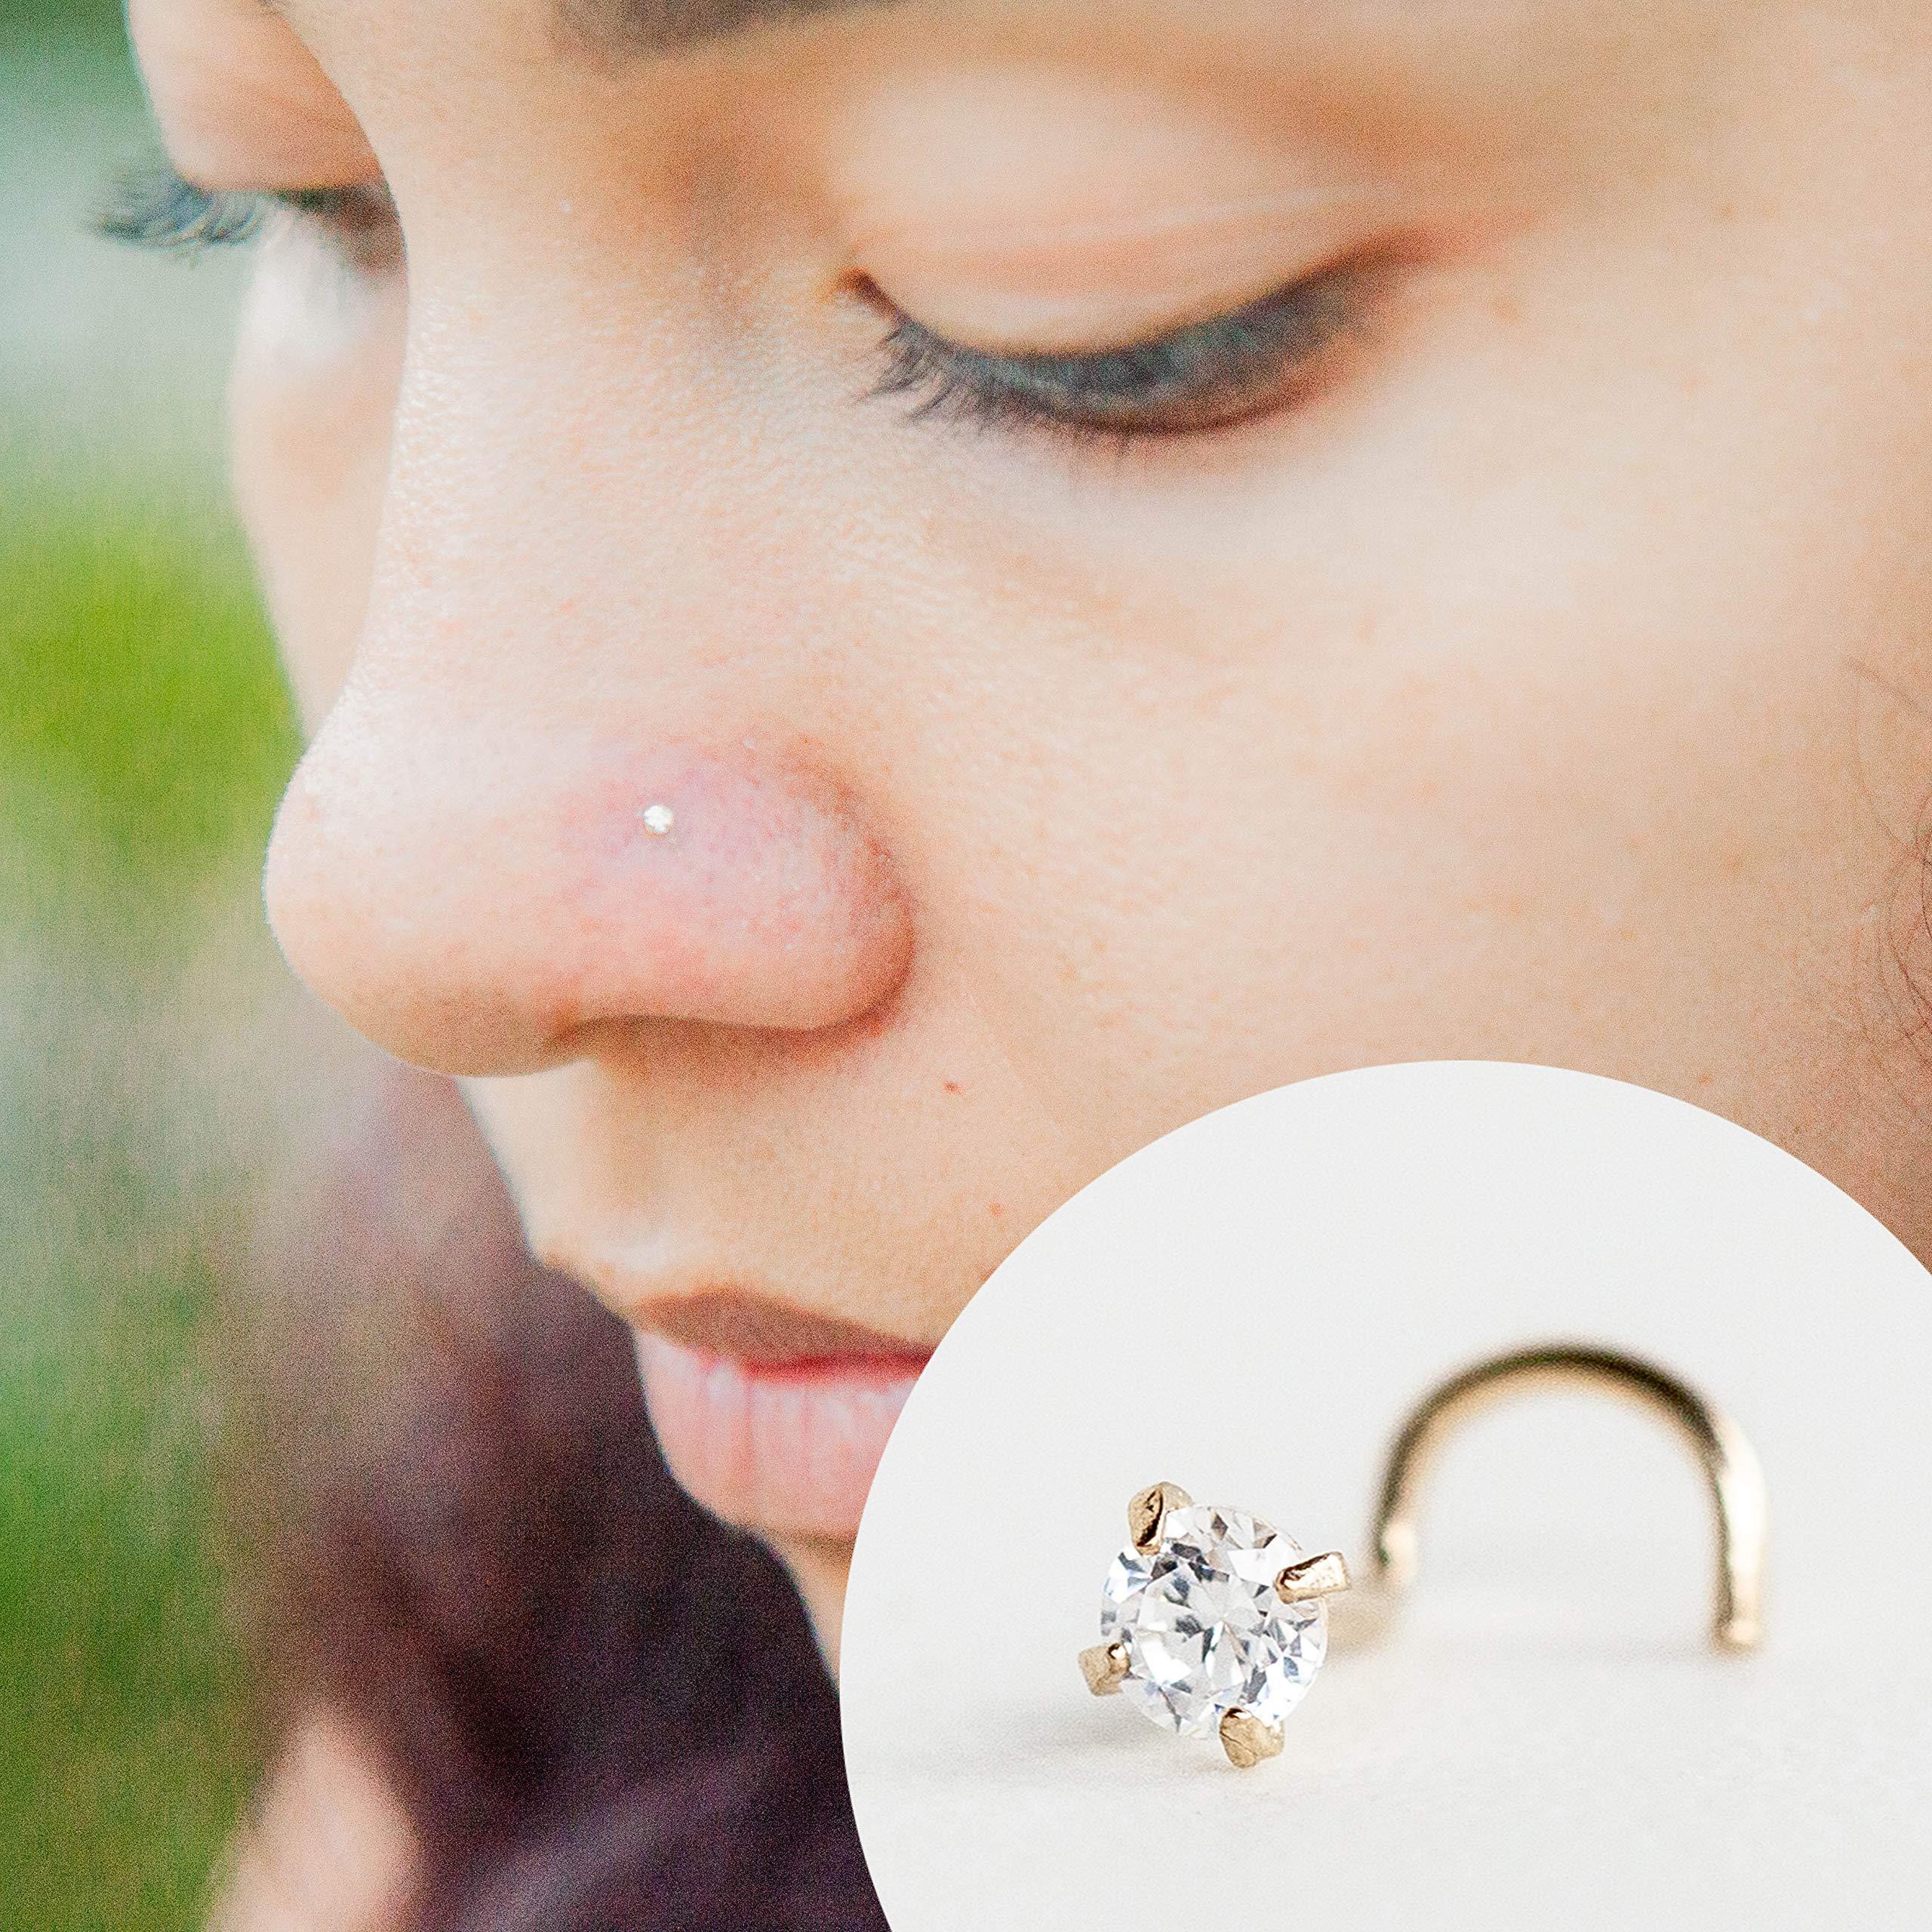 Cubic Zirconia Nose Ring Solid 14k Yellow Gold Handmade 22 Gauge